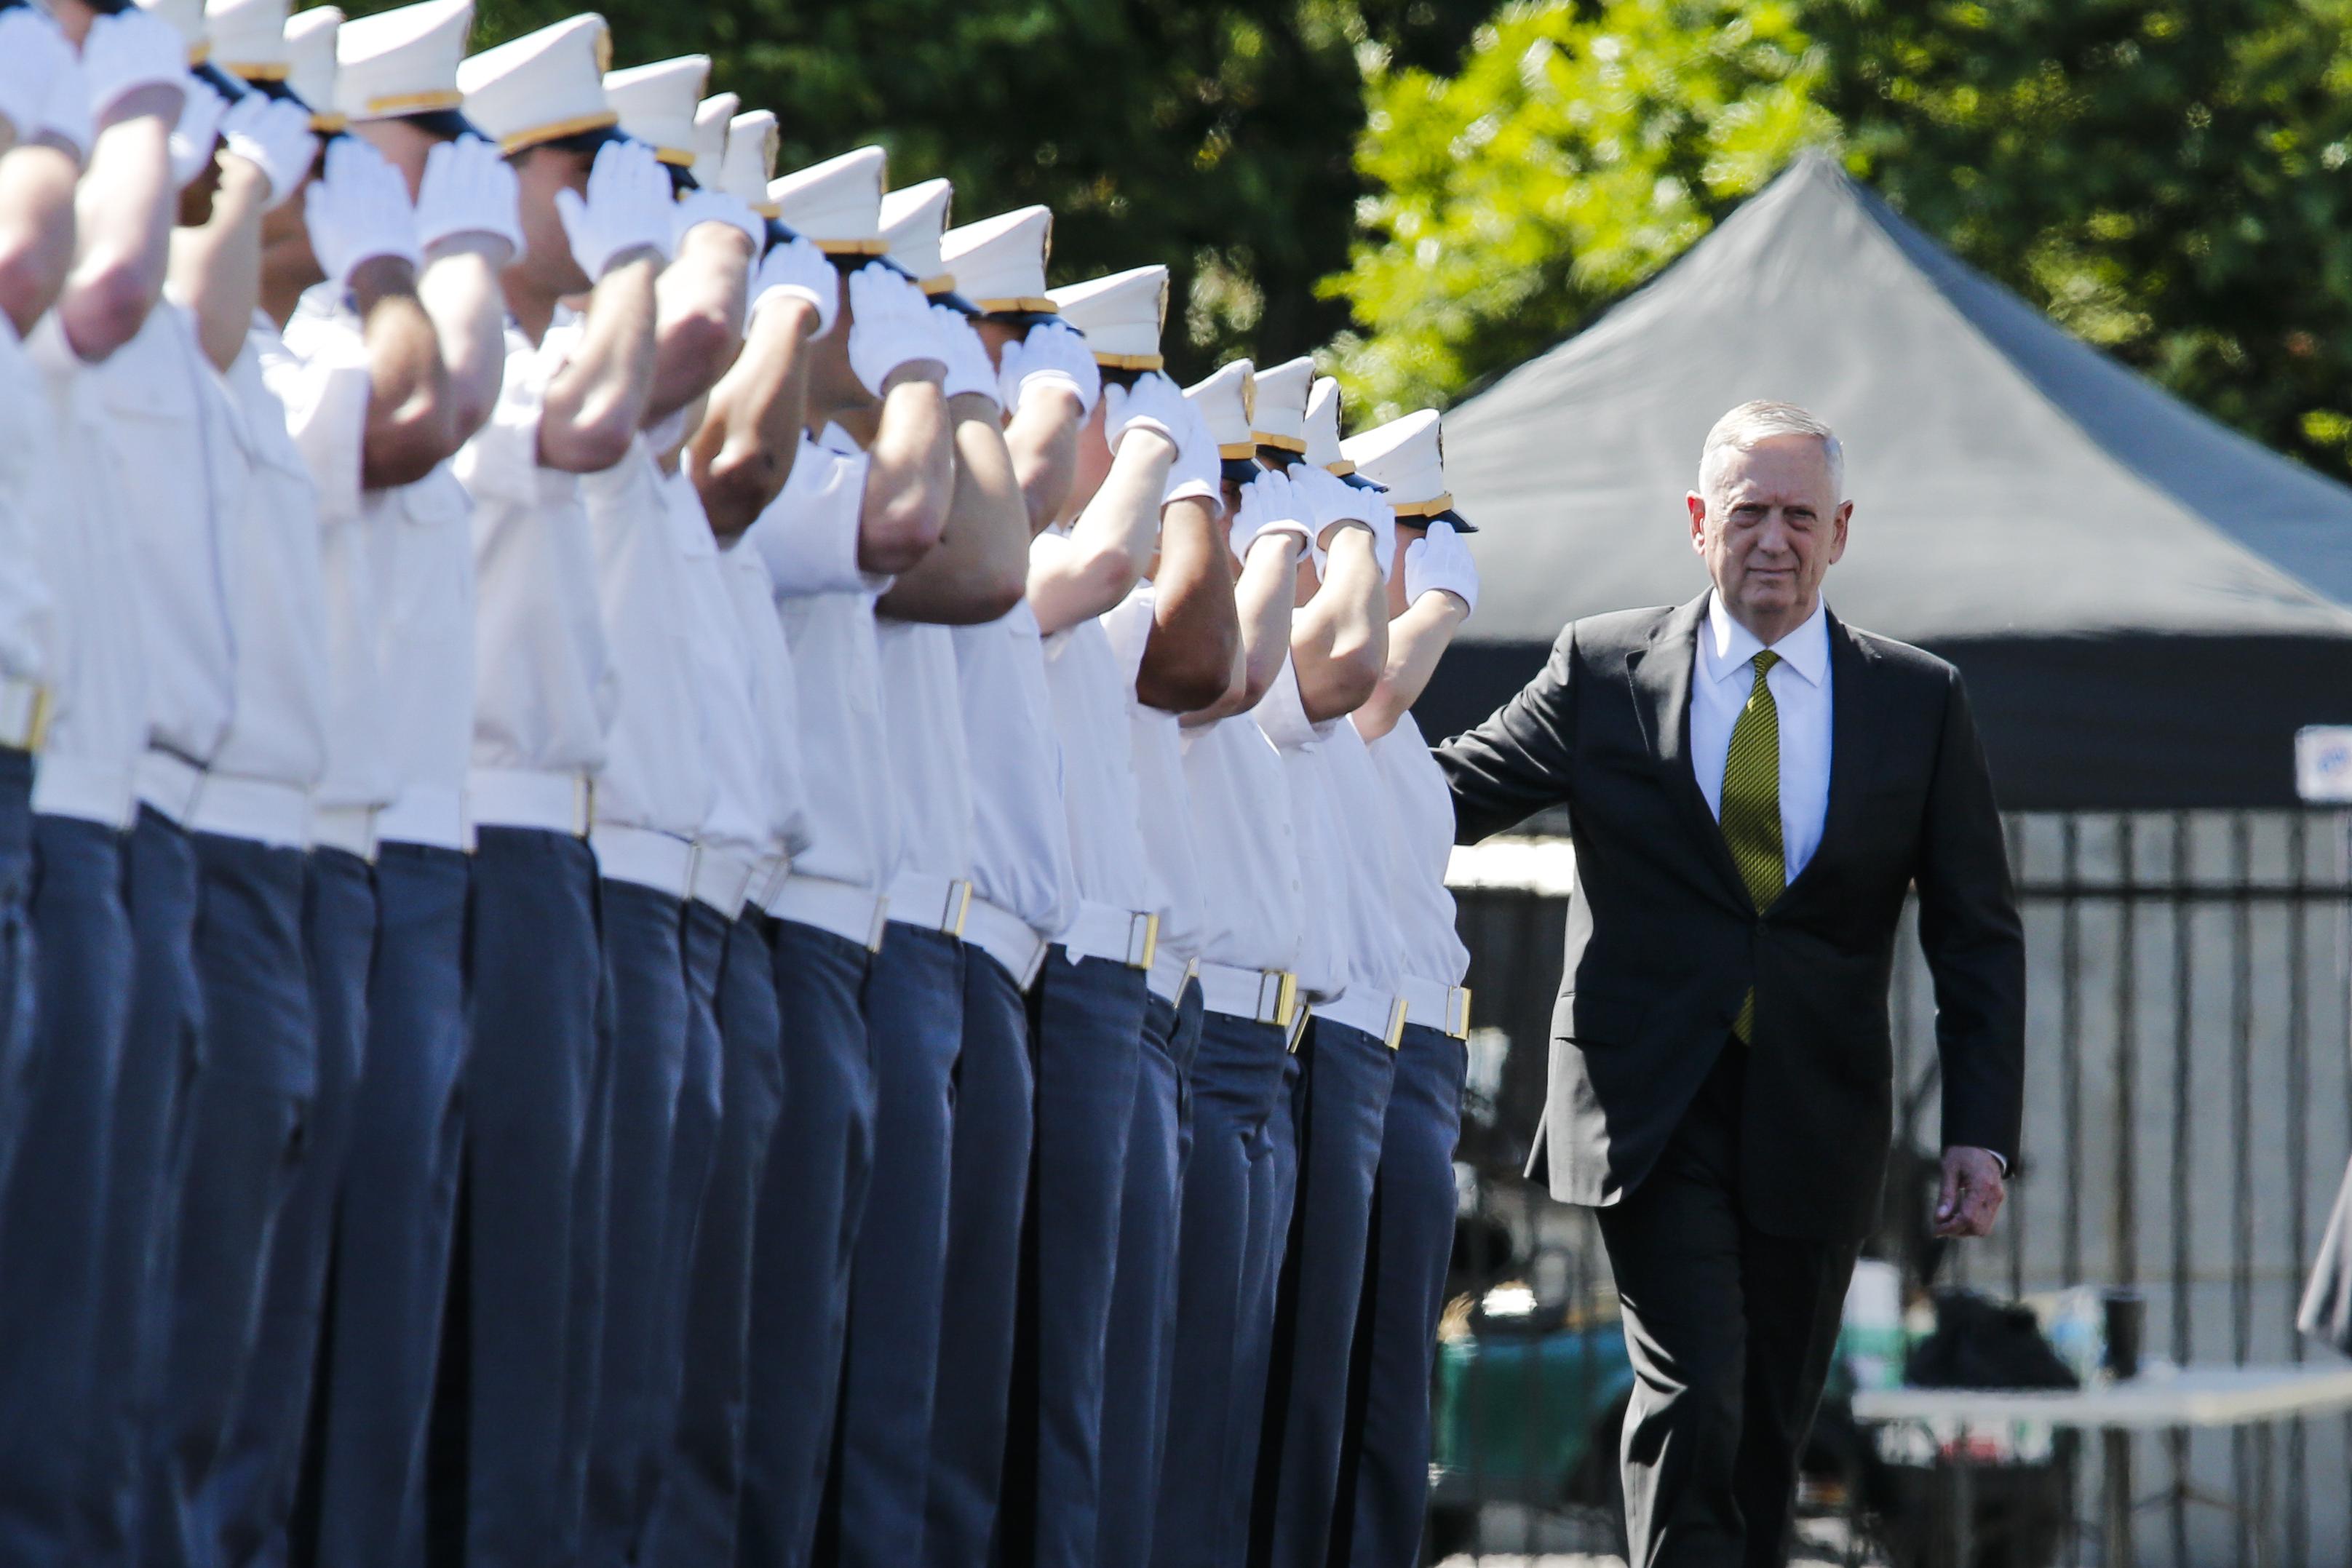 U.S. Defense Secretary Jim Mattis arrives to attend the U.S. Military Academy Class of 2017 graduation ceremony (Photo credit: Eduardo Munoz Alvarez/Getty Images)